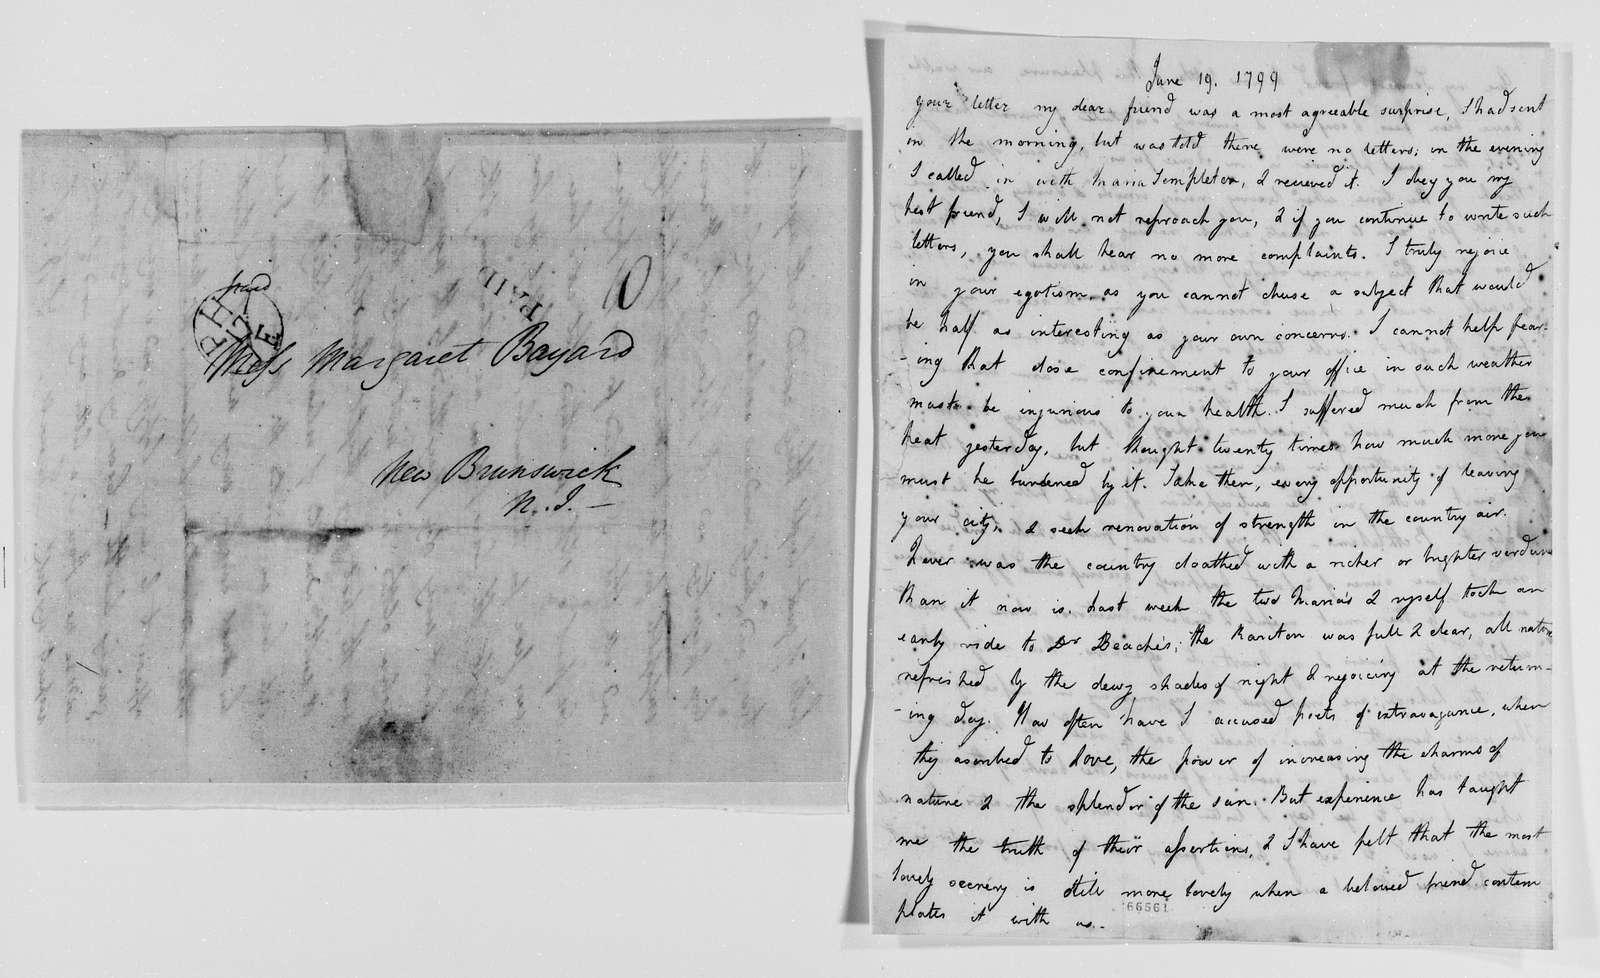 Margaret Bayard Smith Papers: Family Correspondence, 1789-1842; Smith, Samuel Harrison (husband); 1799, Feb.-July